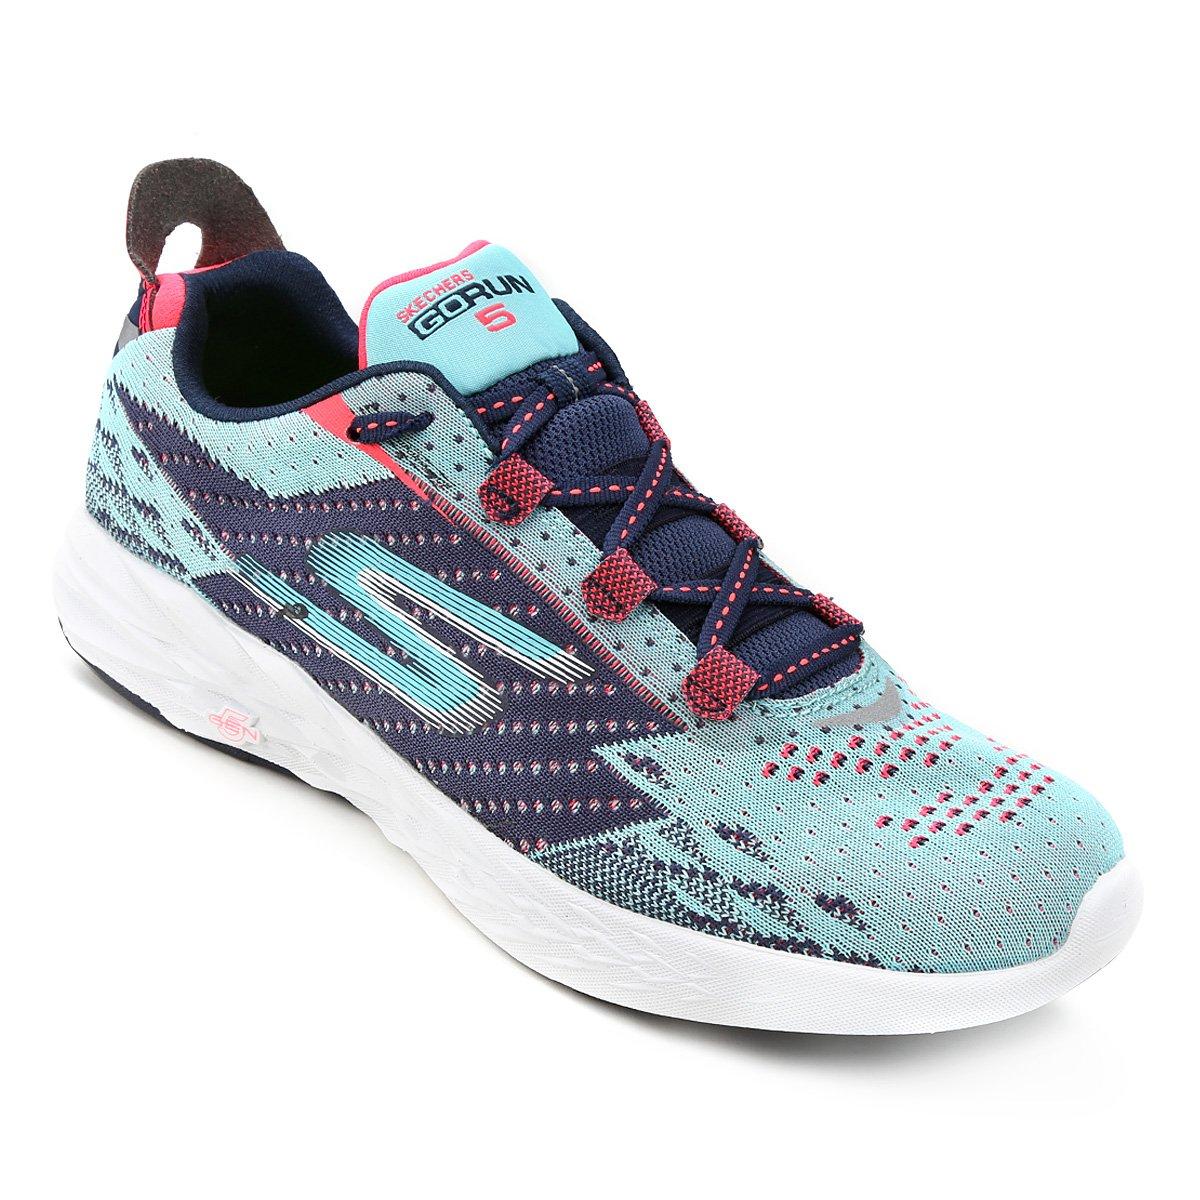 e8c242d881f05 Tênis Skechers Go Run 5 Feminino - Compre Agora